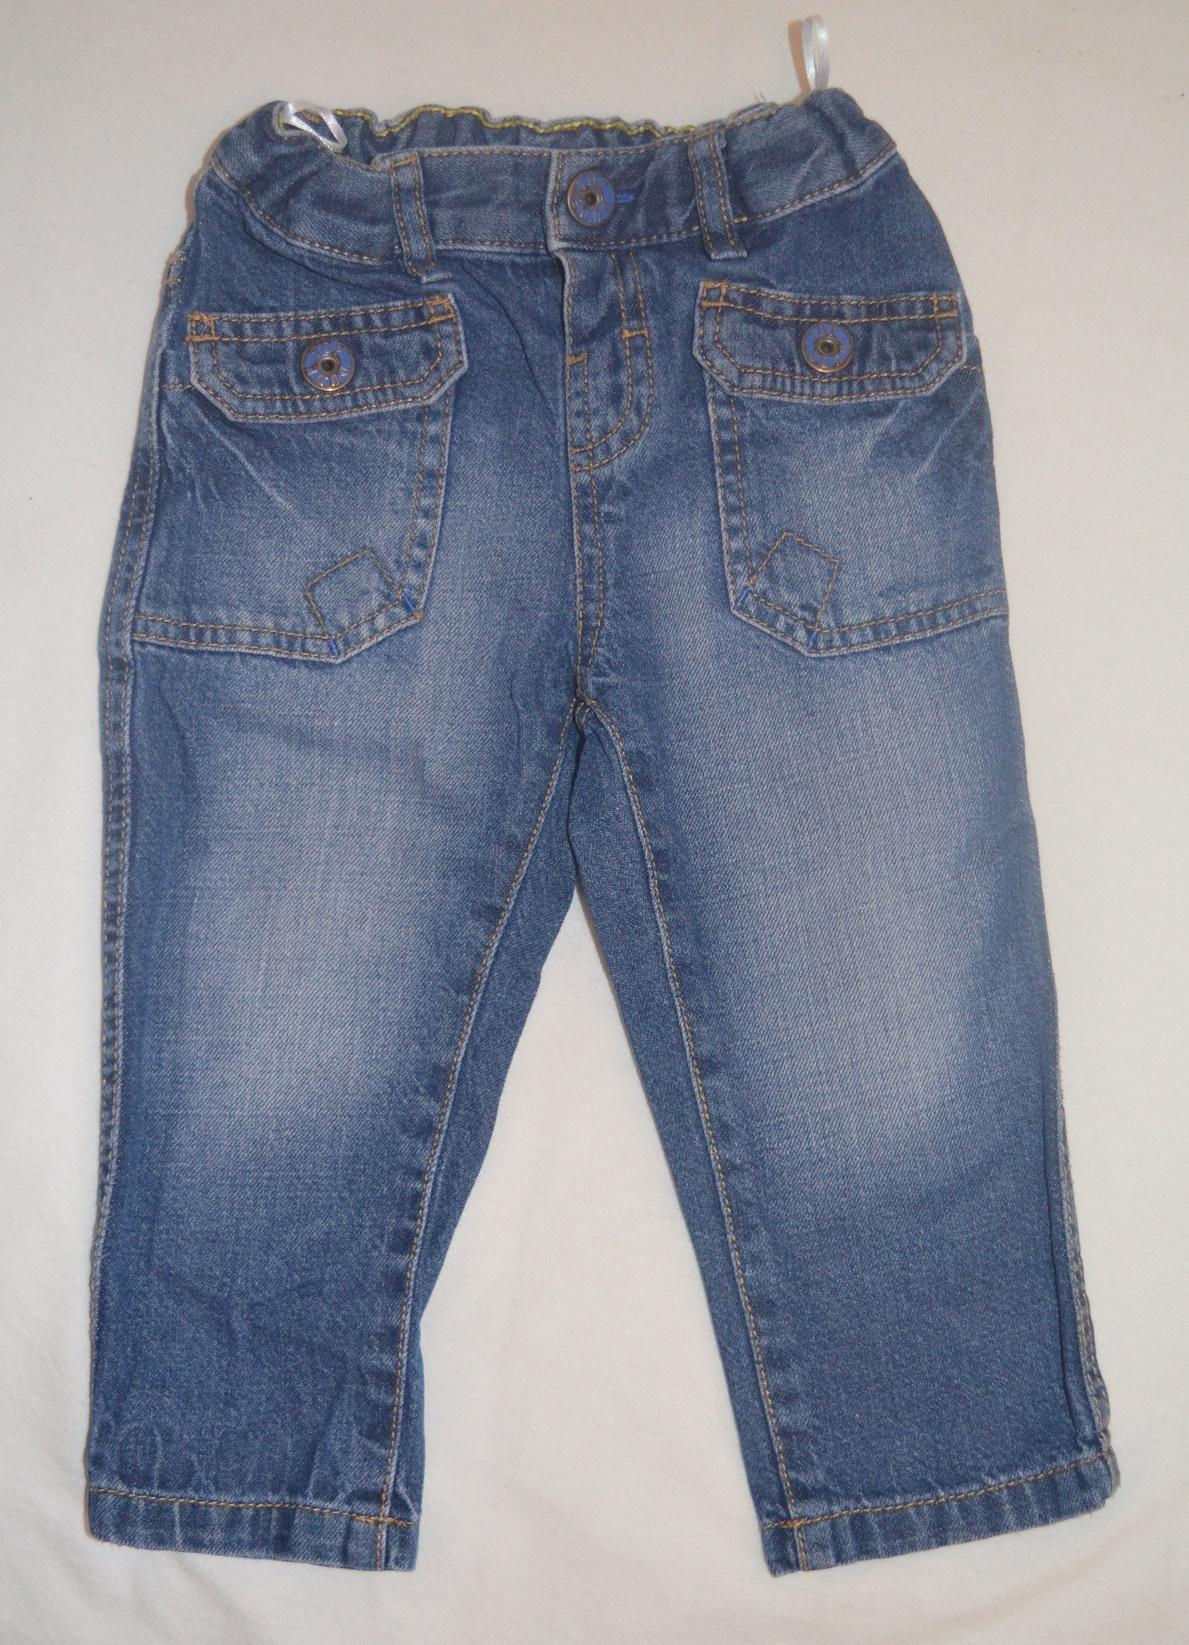 94de7898a3cbe 86 Dla Jeans Roz Super Chłopca amp;a 7270496926 C Spodnie qFpnCxz0